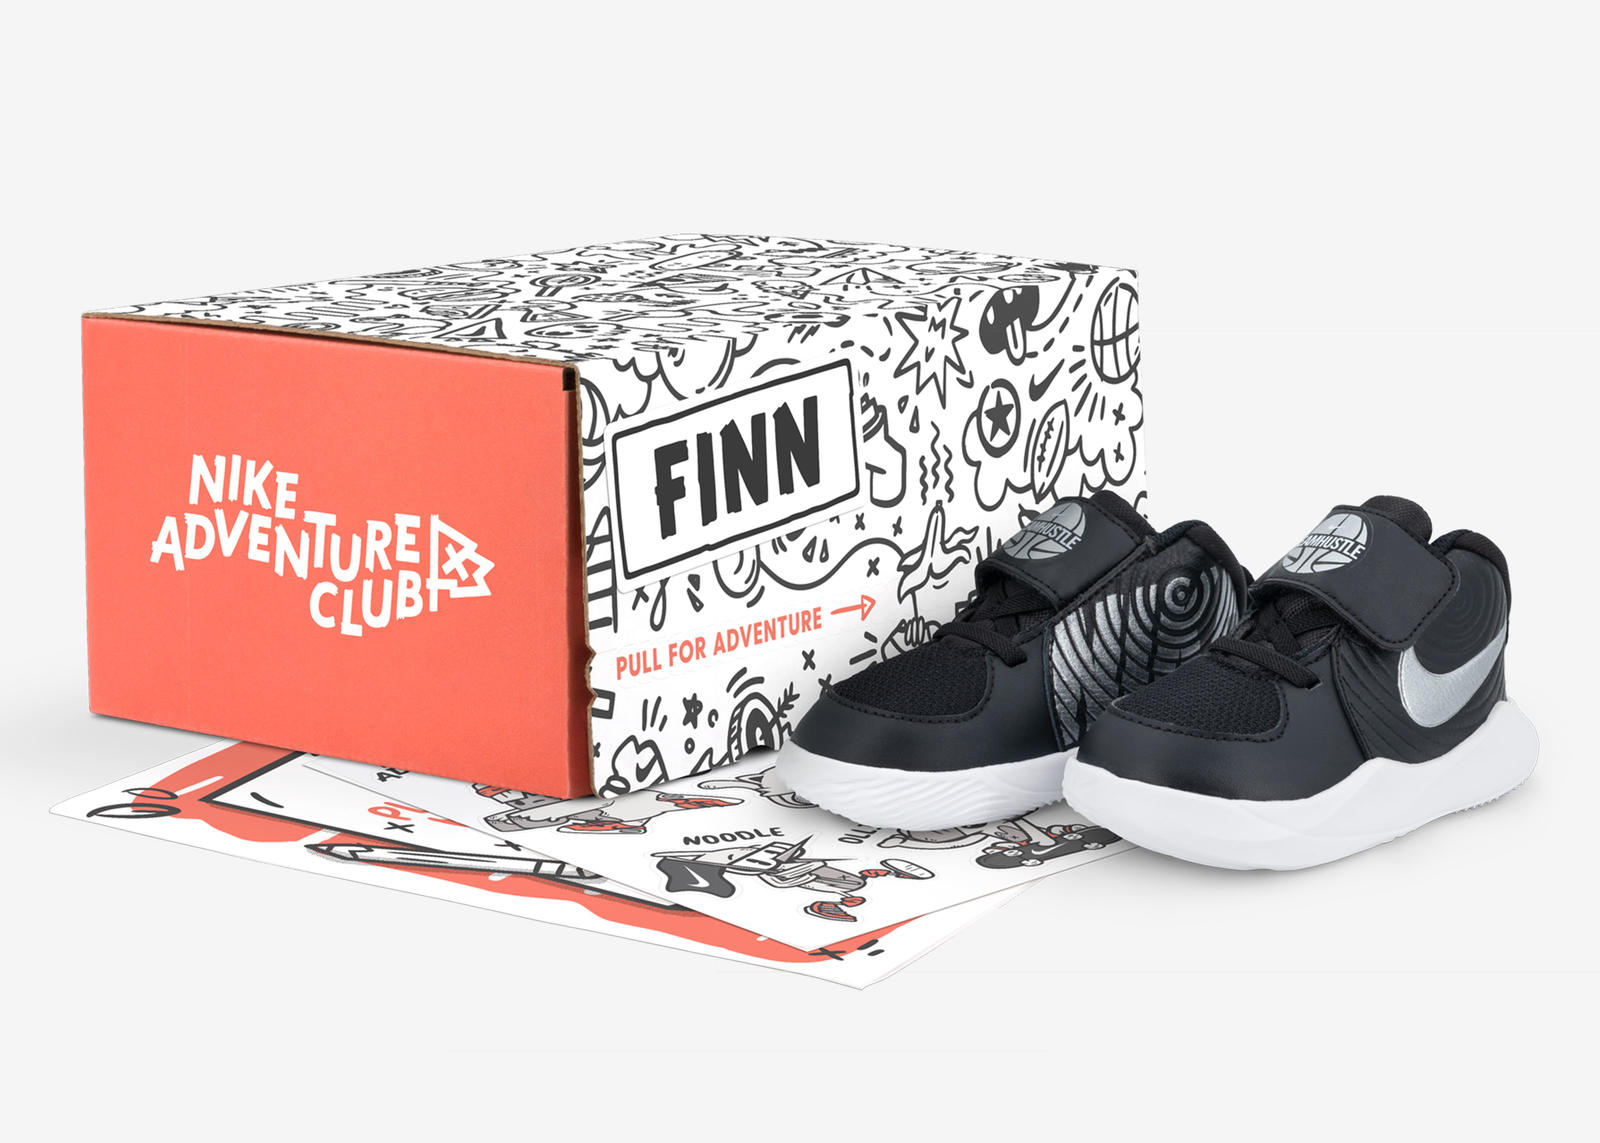 Nike 要让家长不再为孩子买鞋而伤脑筋:首次将按月付费订购的模式引入童鞋领域